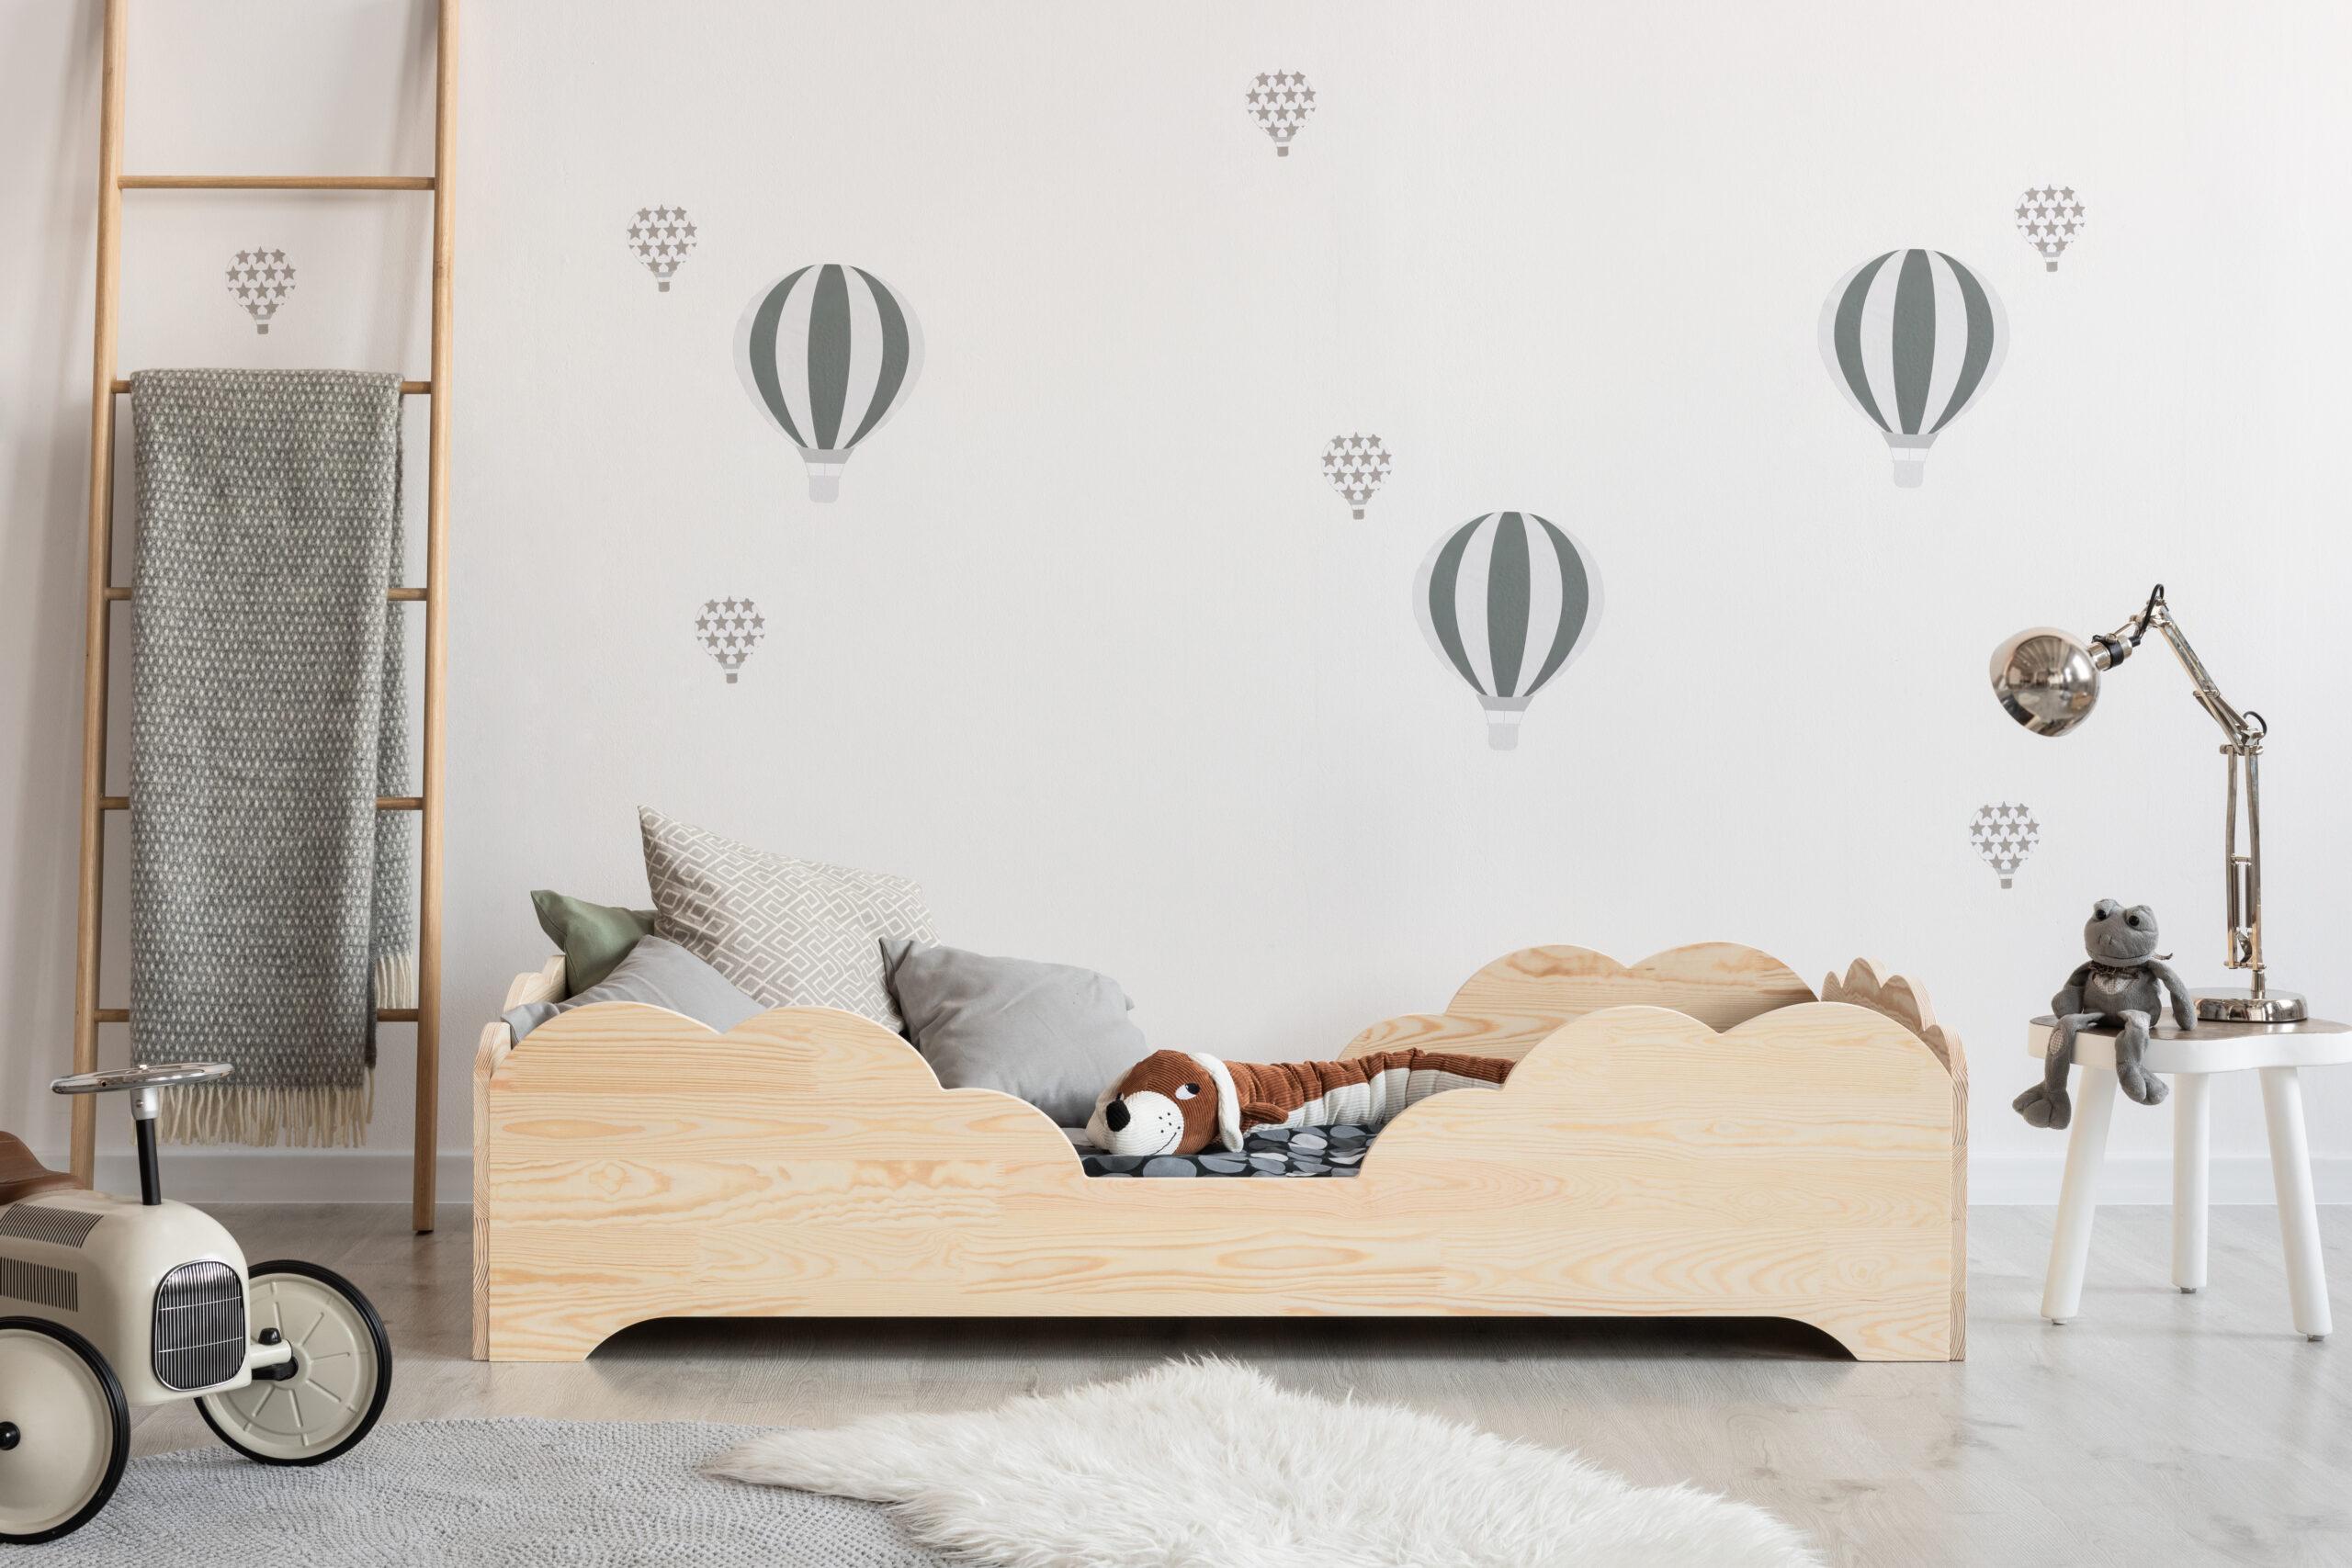 Full Size of Coole Kinderbetten Kinderbett Bo10 1431 Minimidi Design T Shirt Sprüche Betten T Shirt Wohnzimmer Coole Kinderbetten